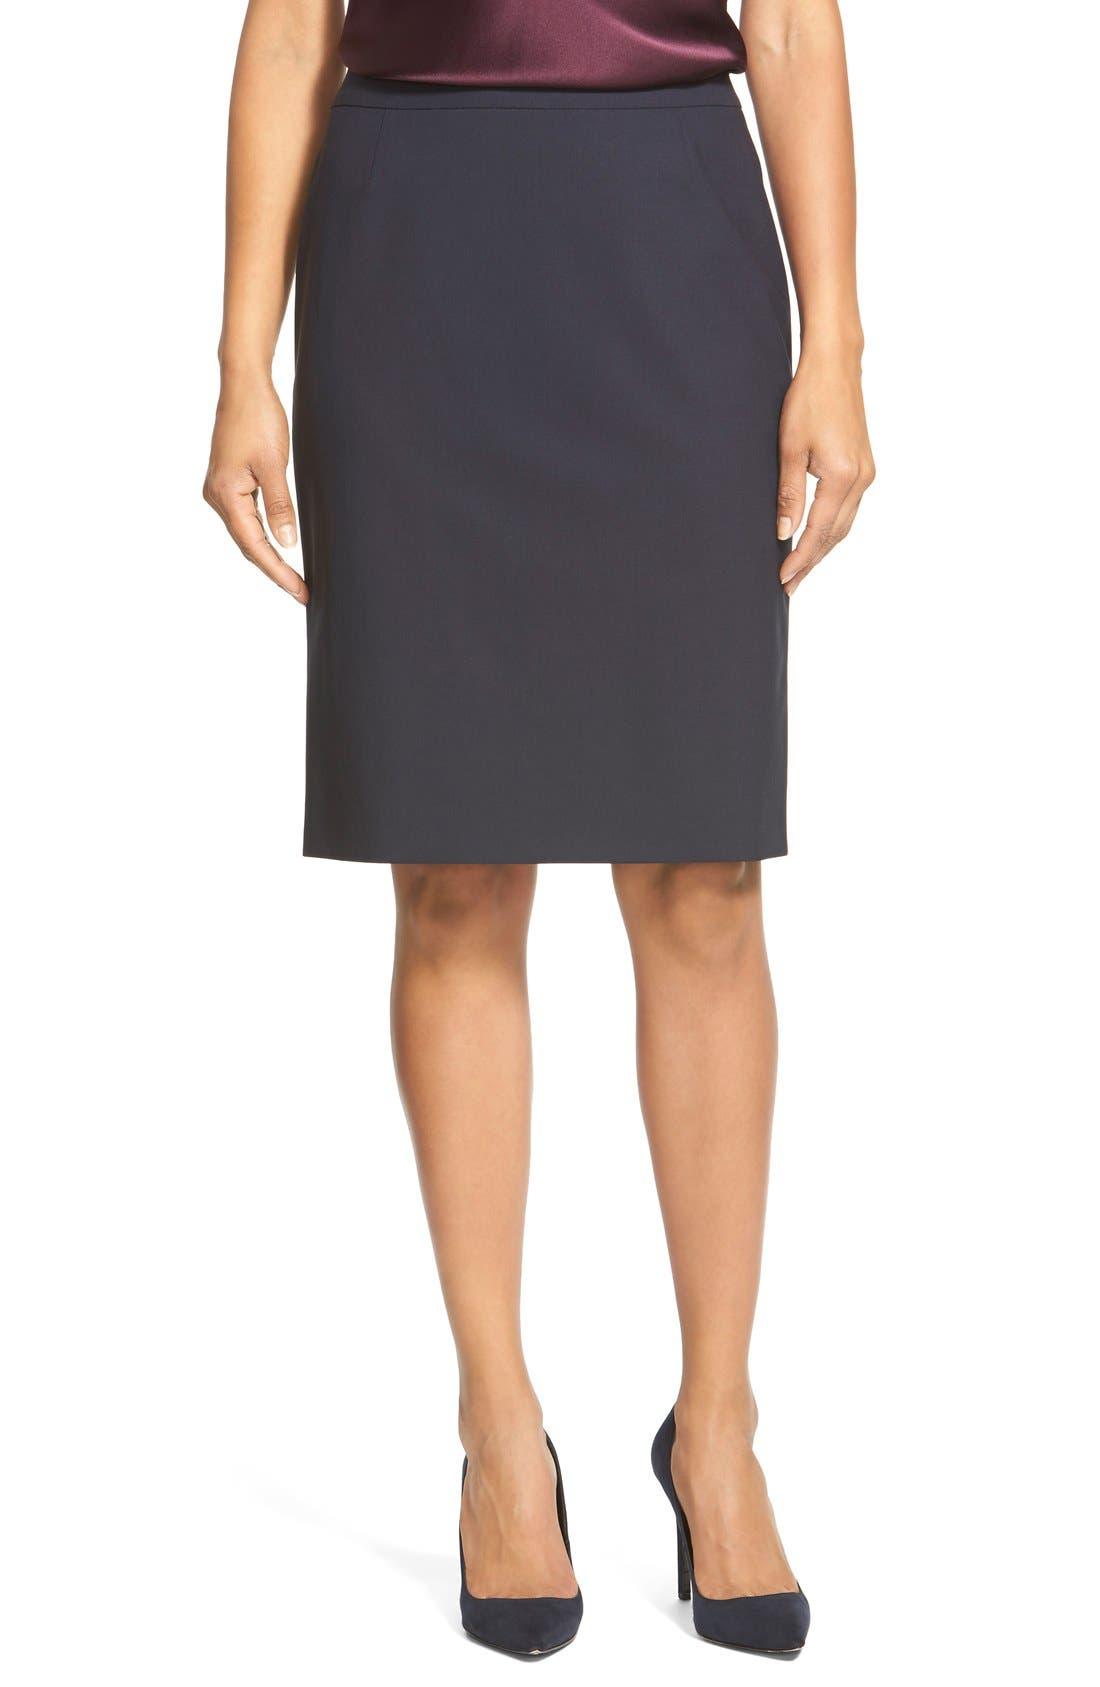 Vilea Tropical Stretch Wool Pencil Skirt,                             Main thumbnail 4, color,